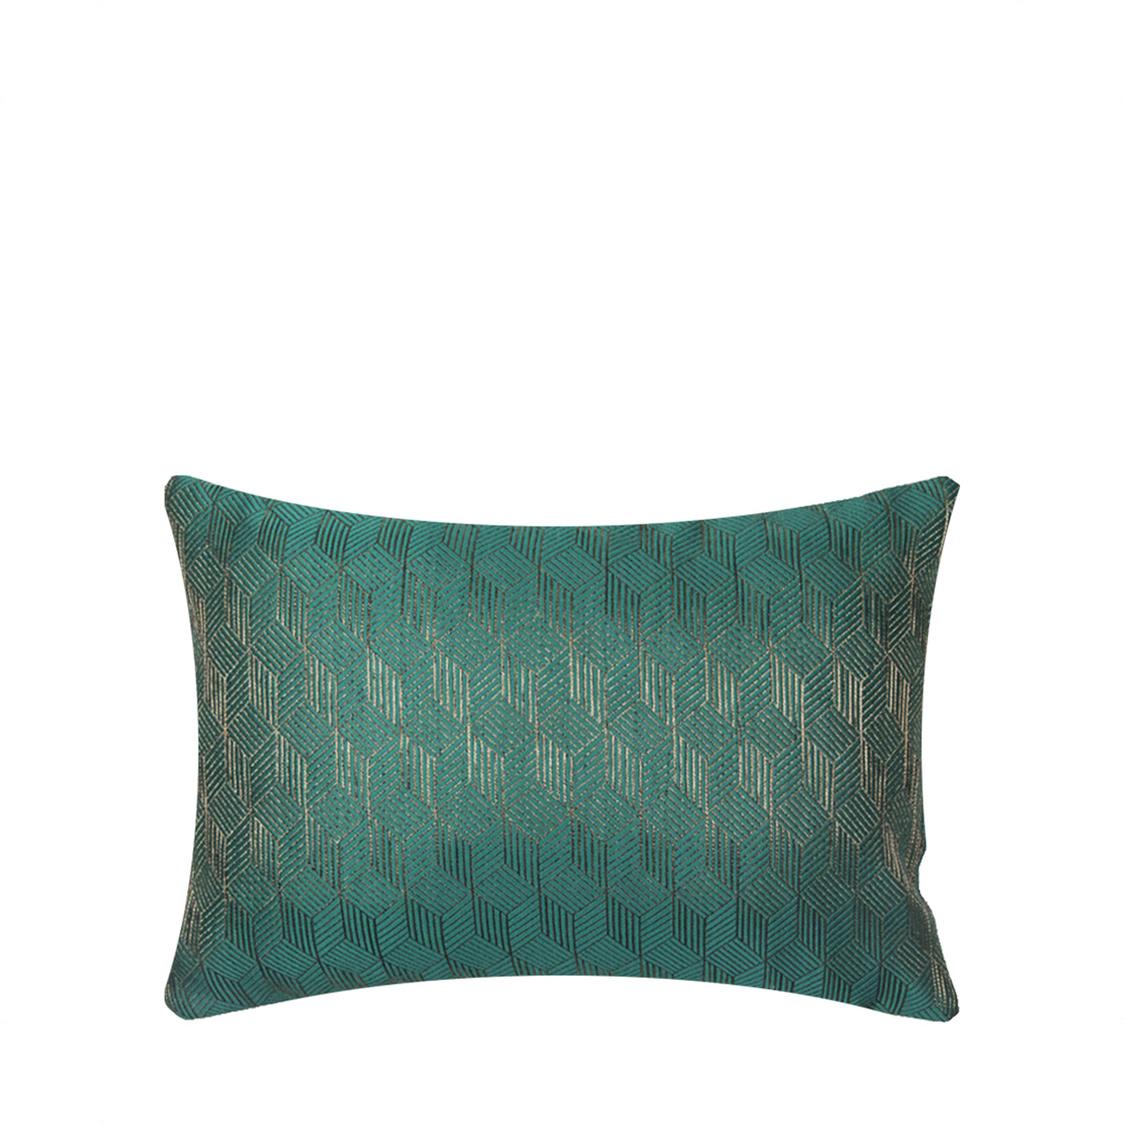 JRapee Anthunam Oblong Cushion Green 33x48cm